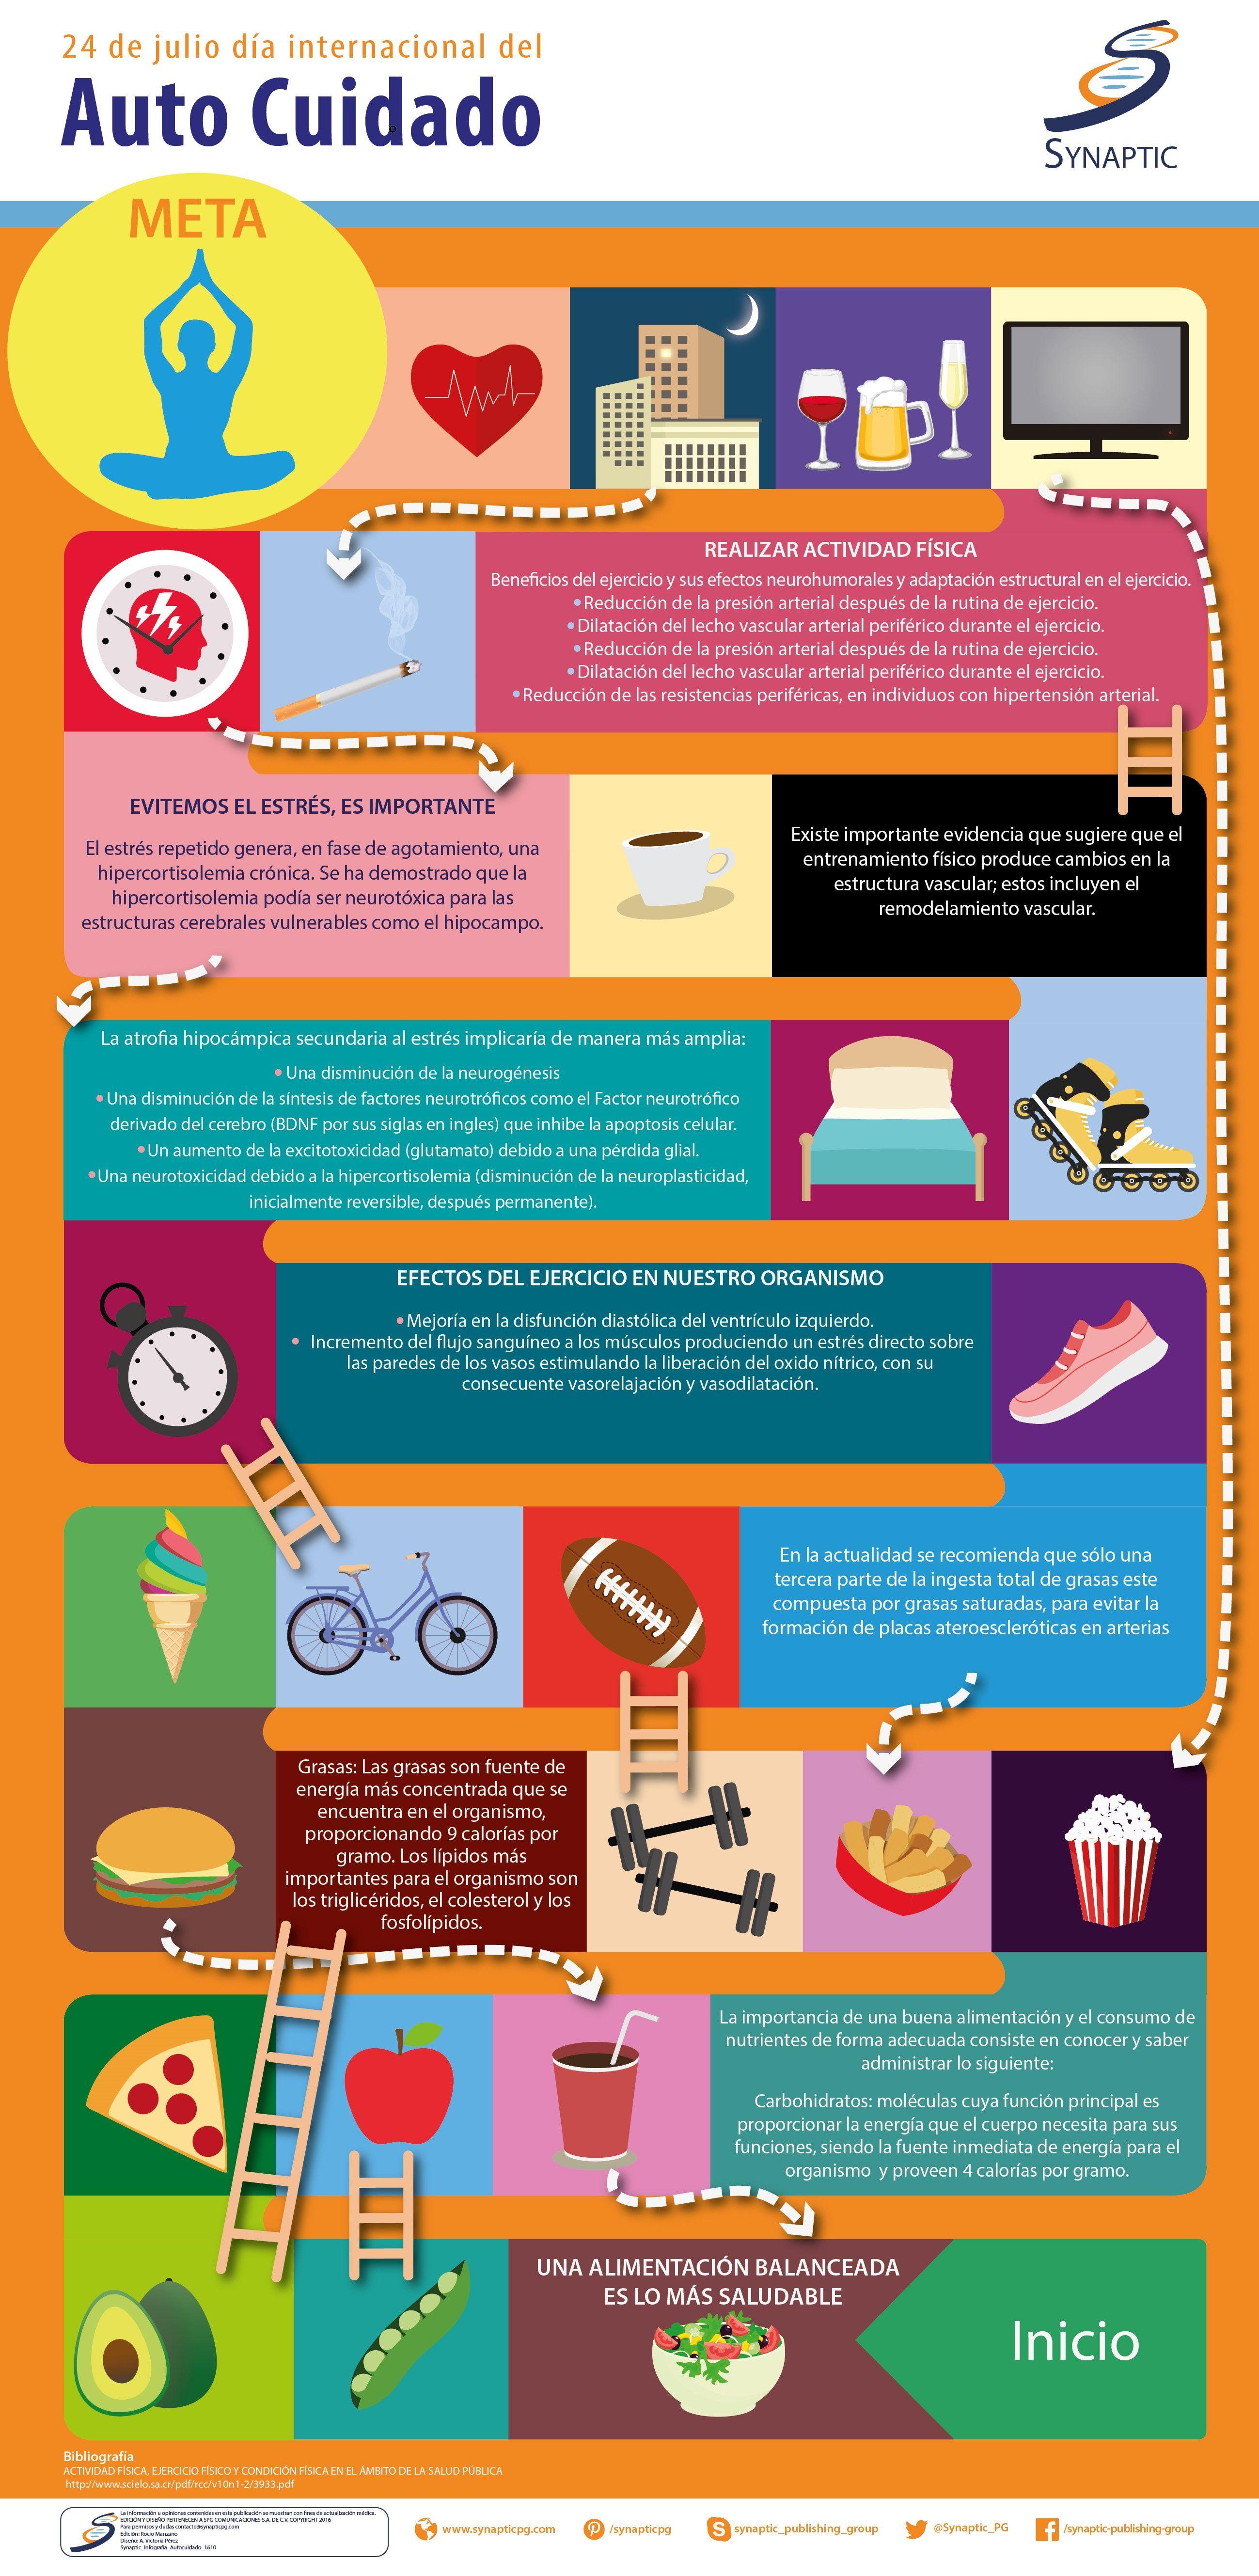 #Synaptic #Infografia #Autocuidado #Salud # ...